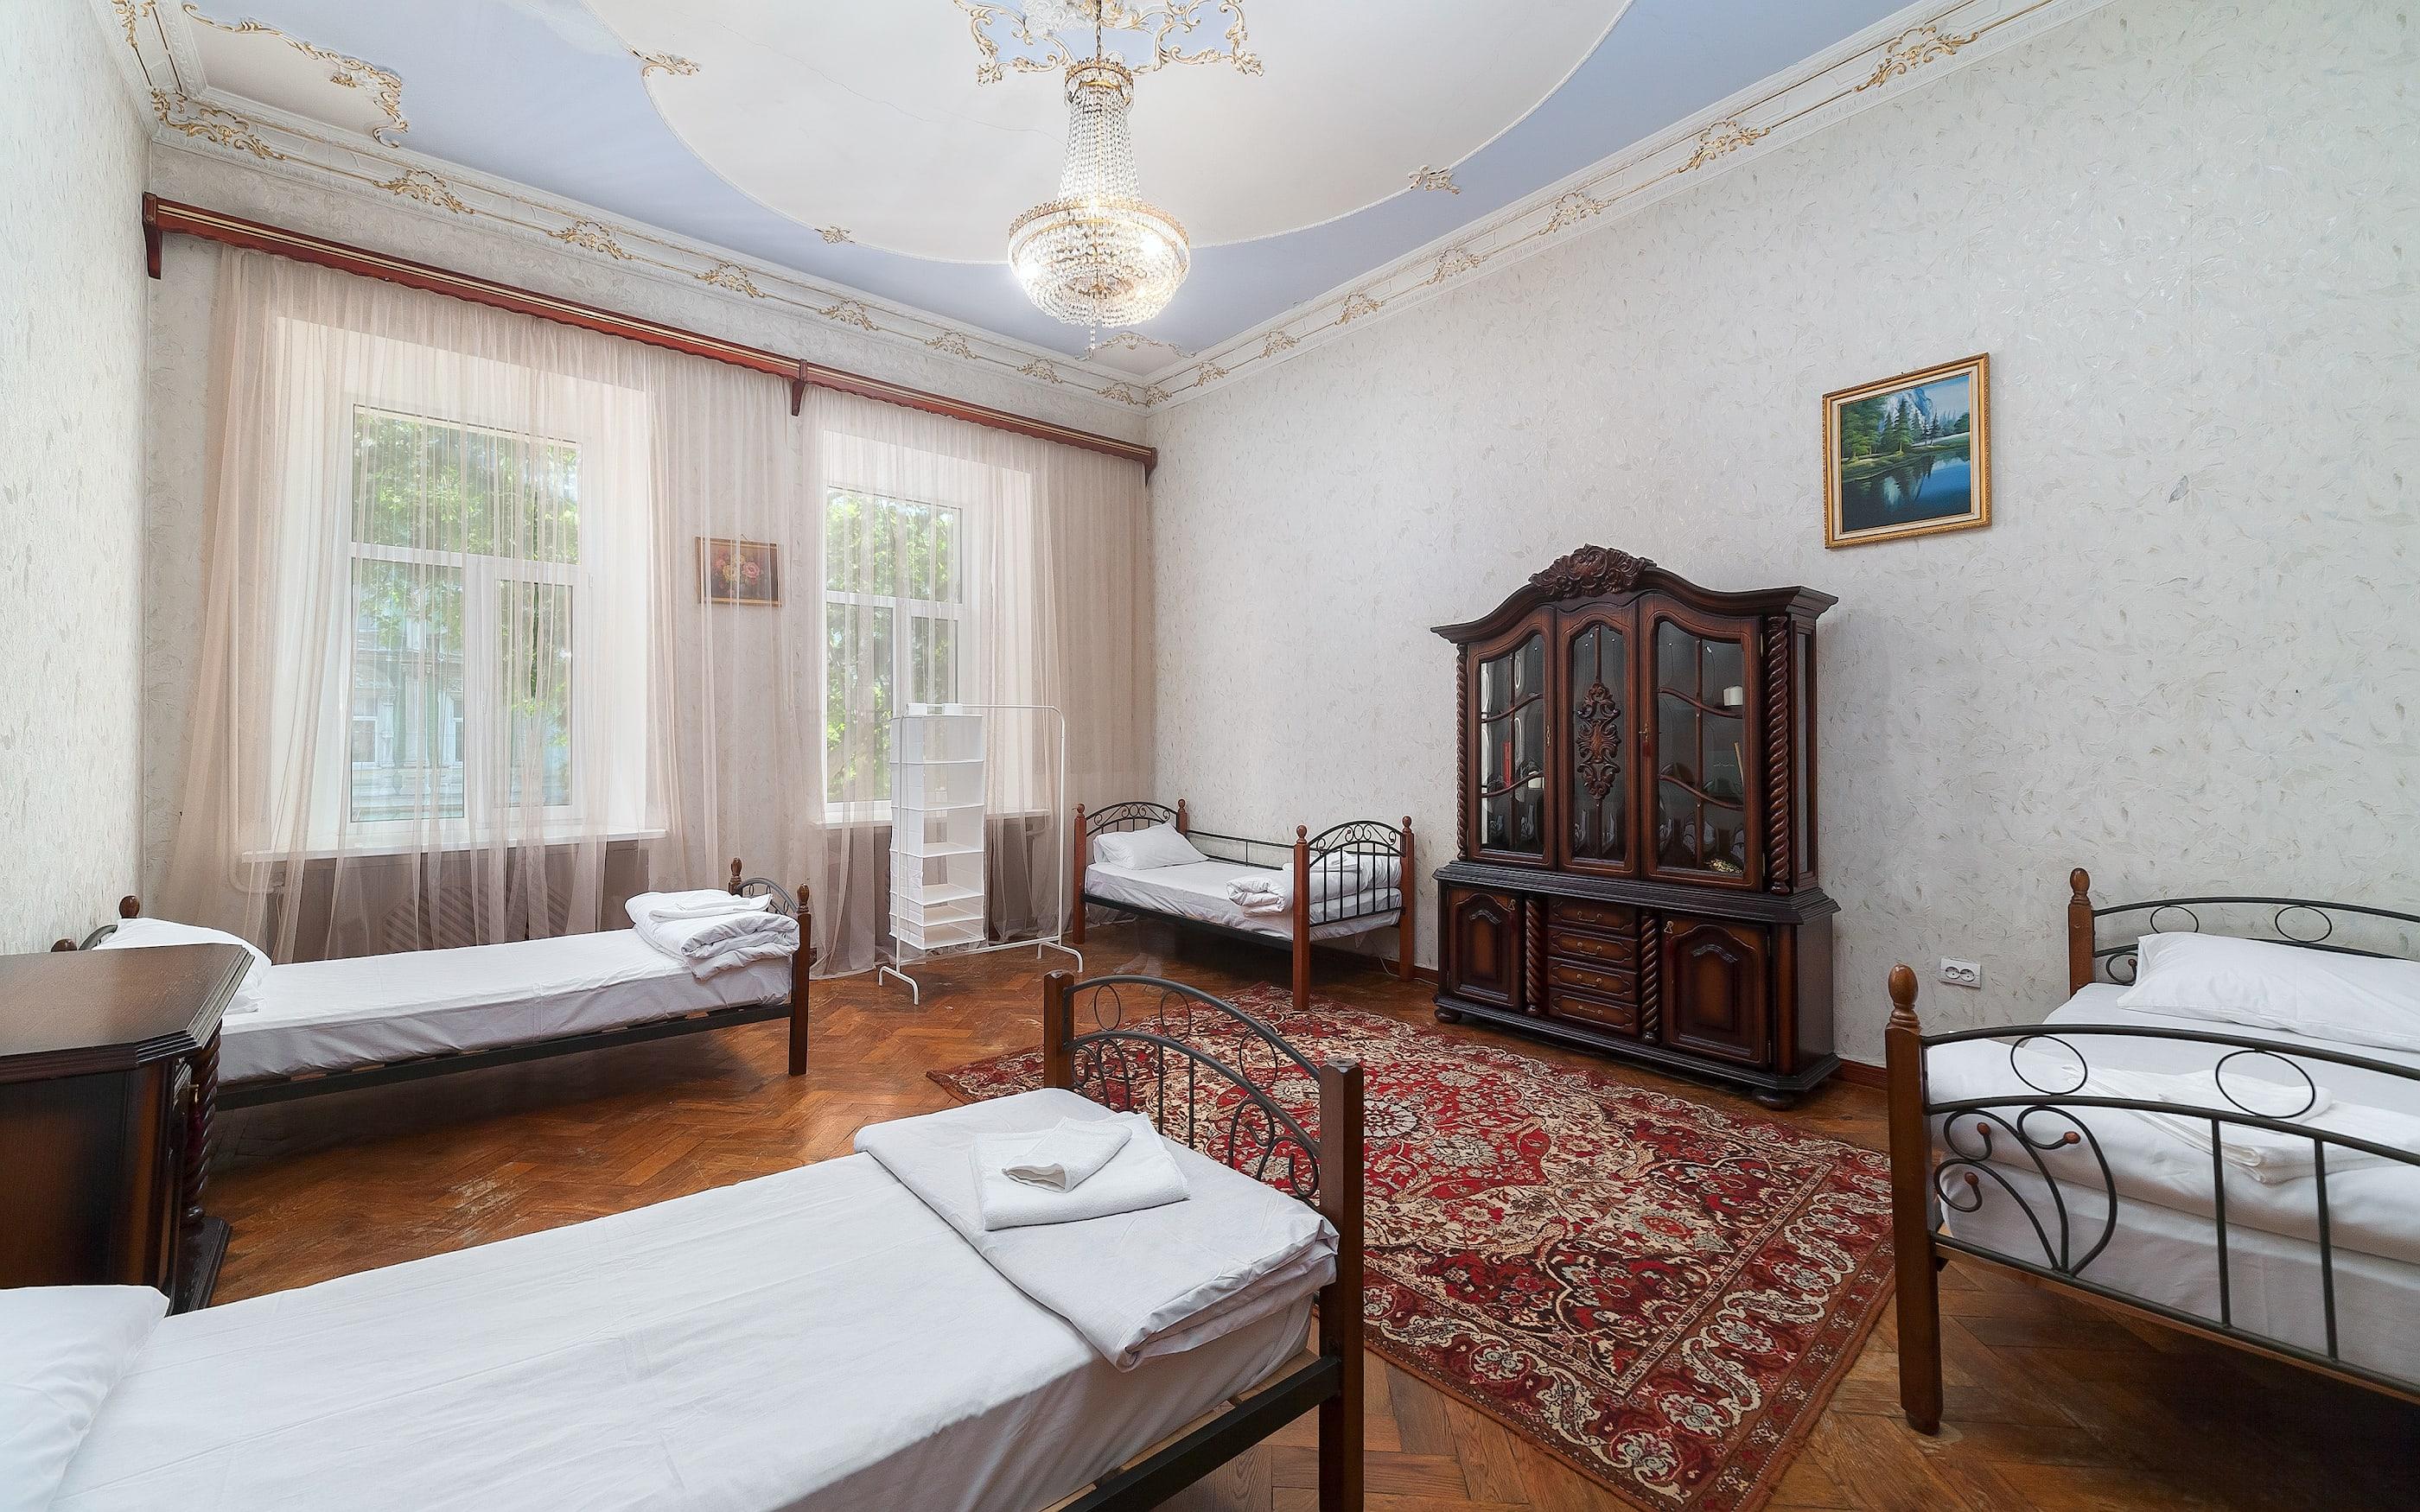 The Babushka Grand Hostel